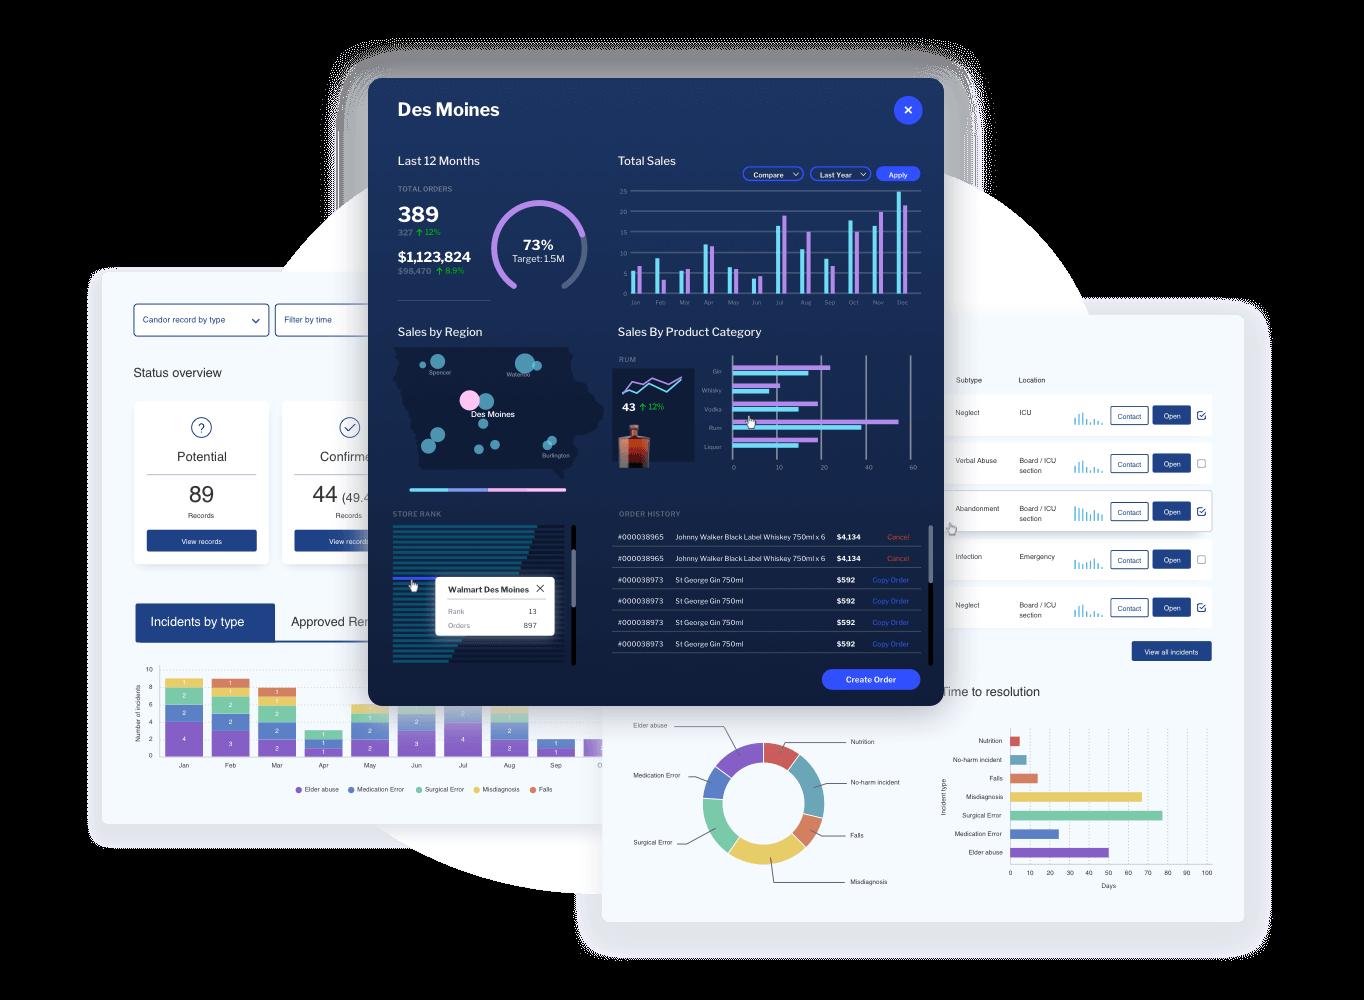 Best embedded analytics solution enterprise and software vendors